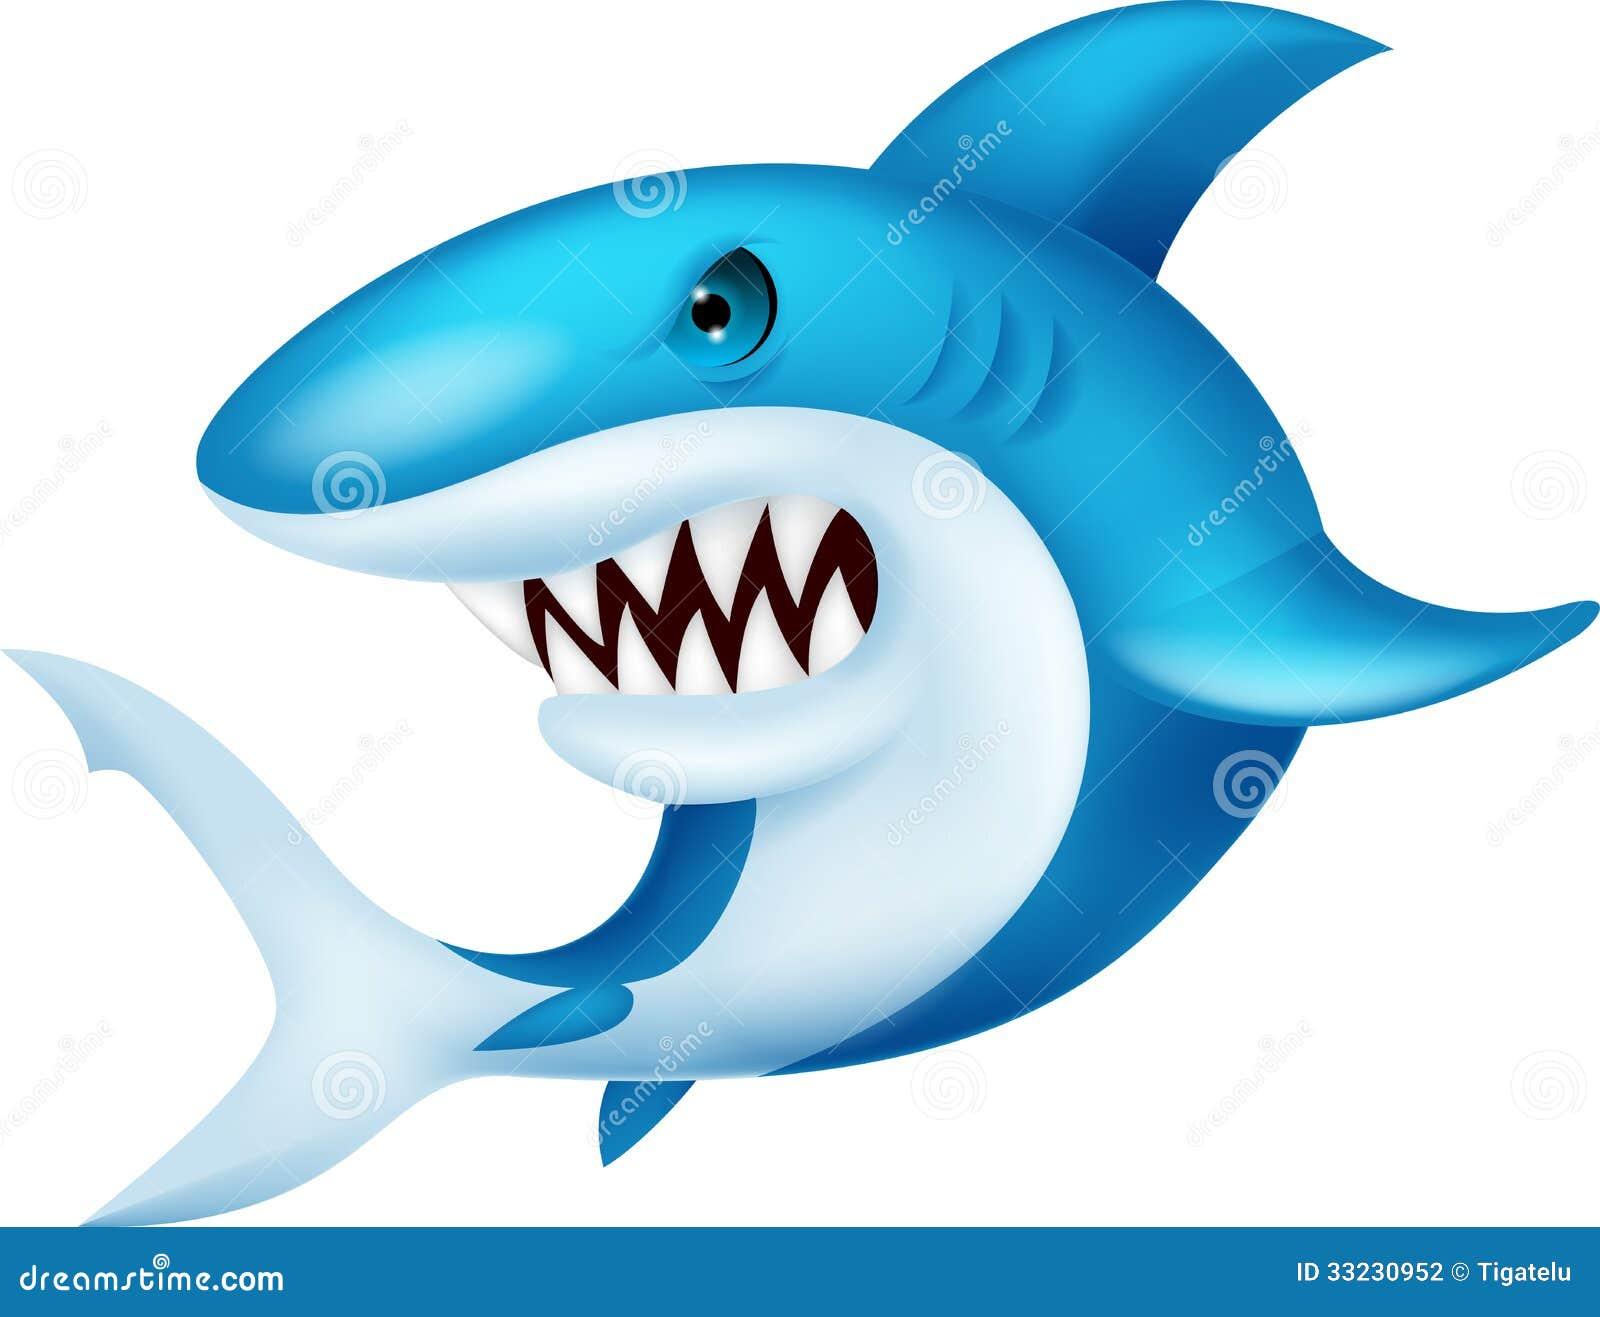 Download Shark cartoon stock vector. Illustration of cartoon, comics - 33230952